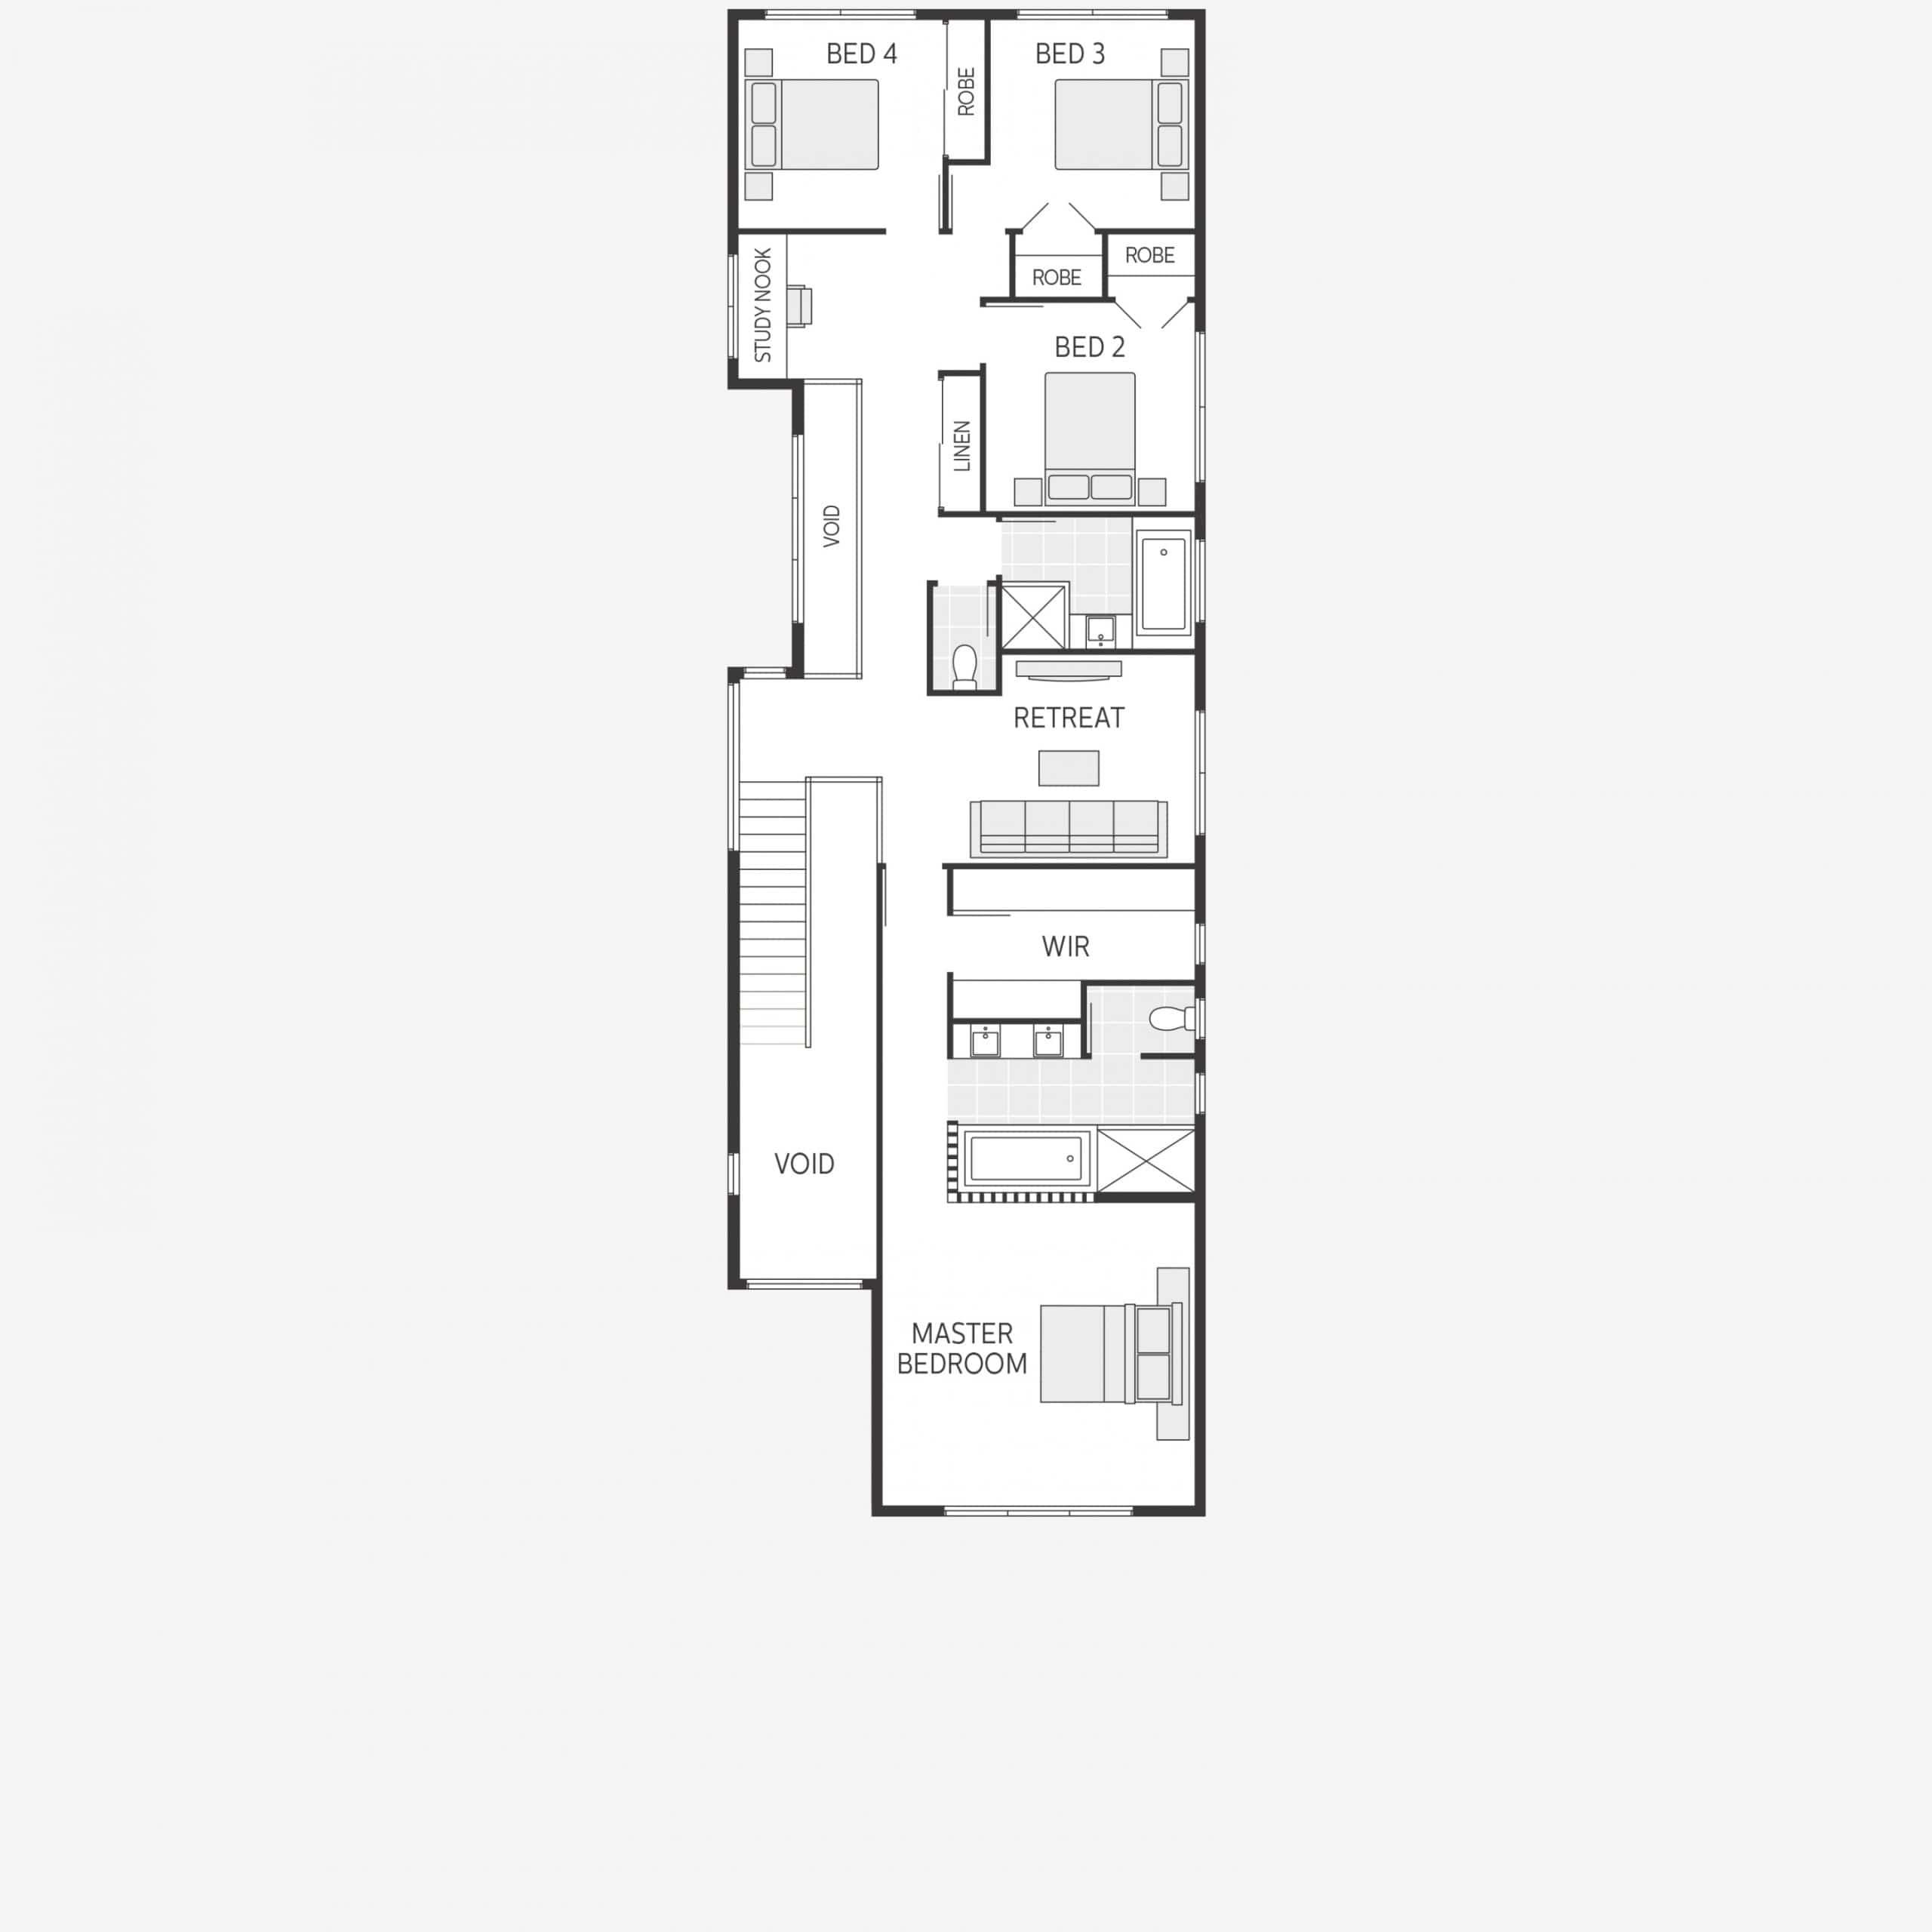 Dise os de casas ideas con planos y fotos construye hogar for Planos de construccion de casas pequenas